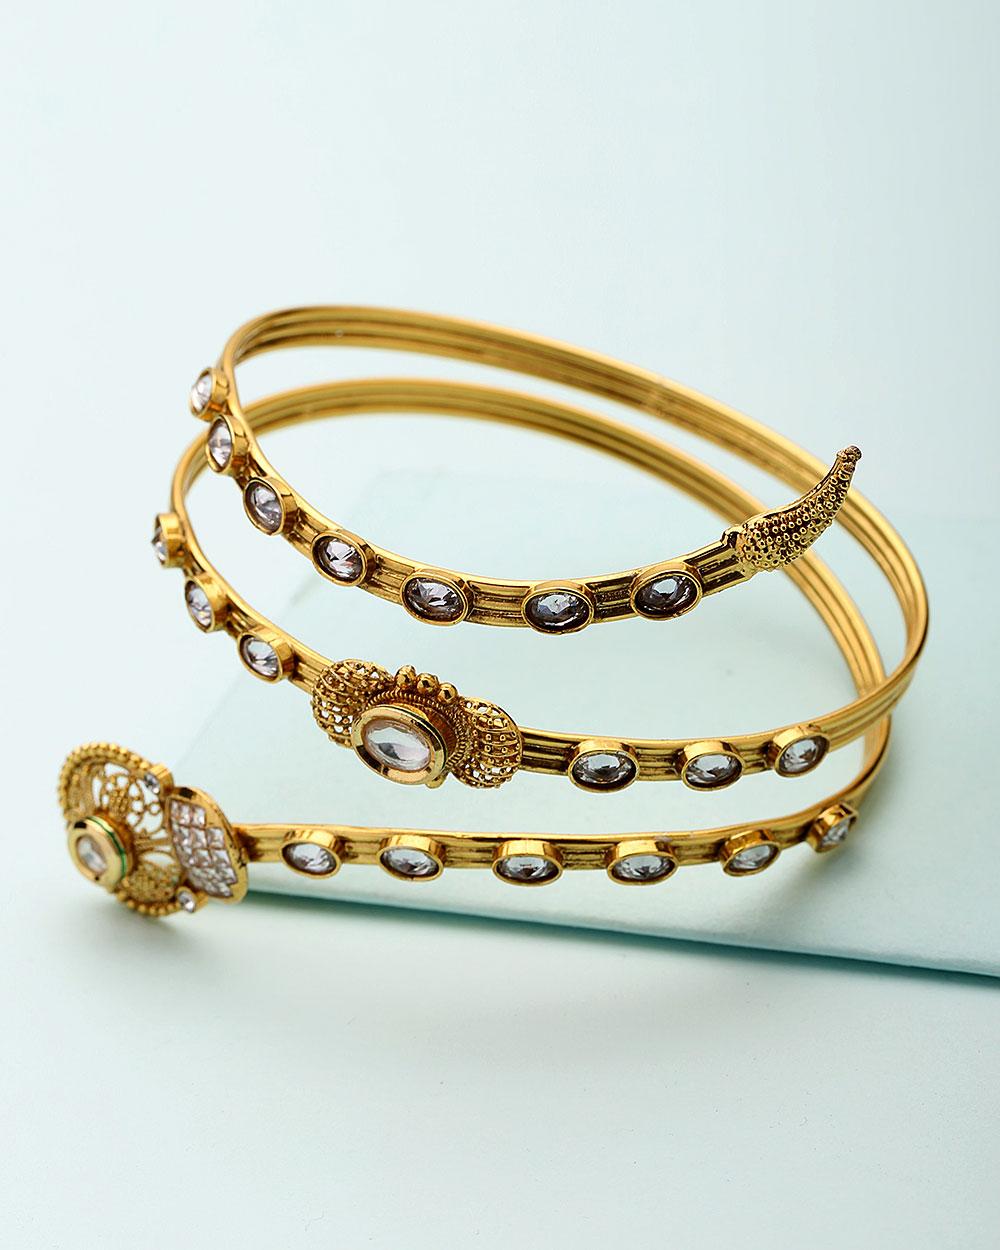 Buy Ethic Spiral Design Bajuband For Women Online India | Voylla